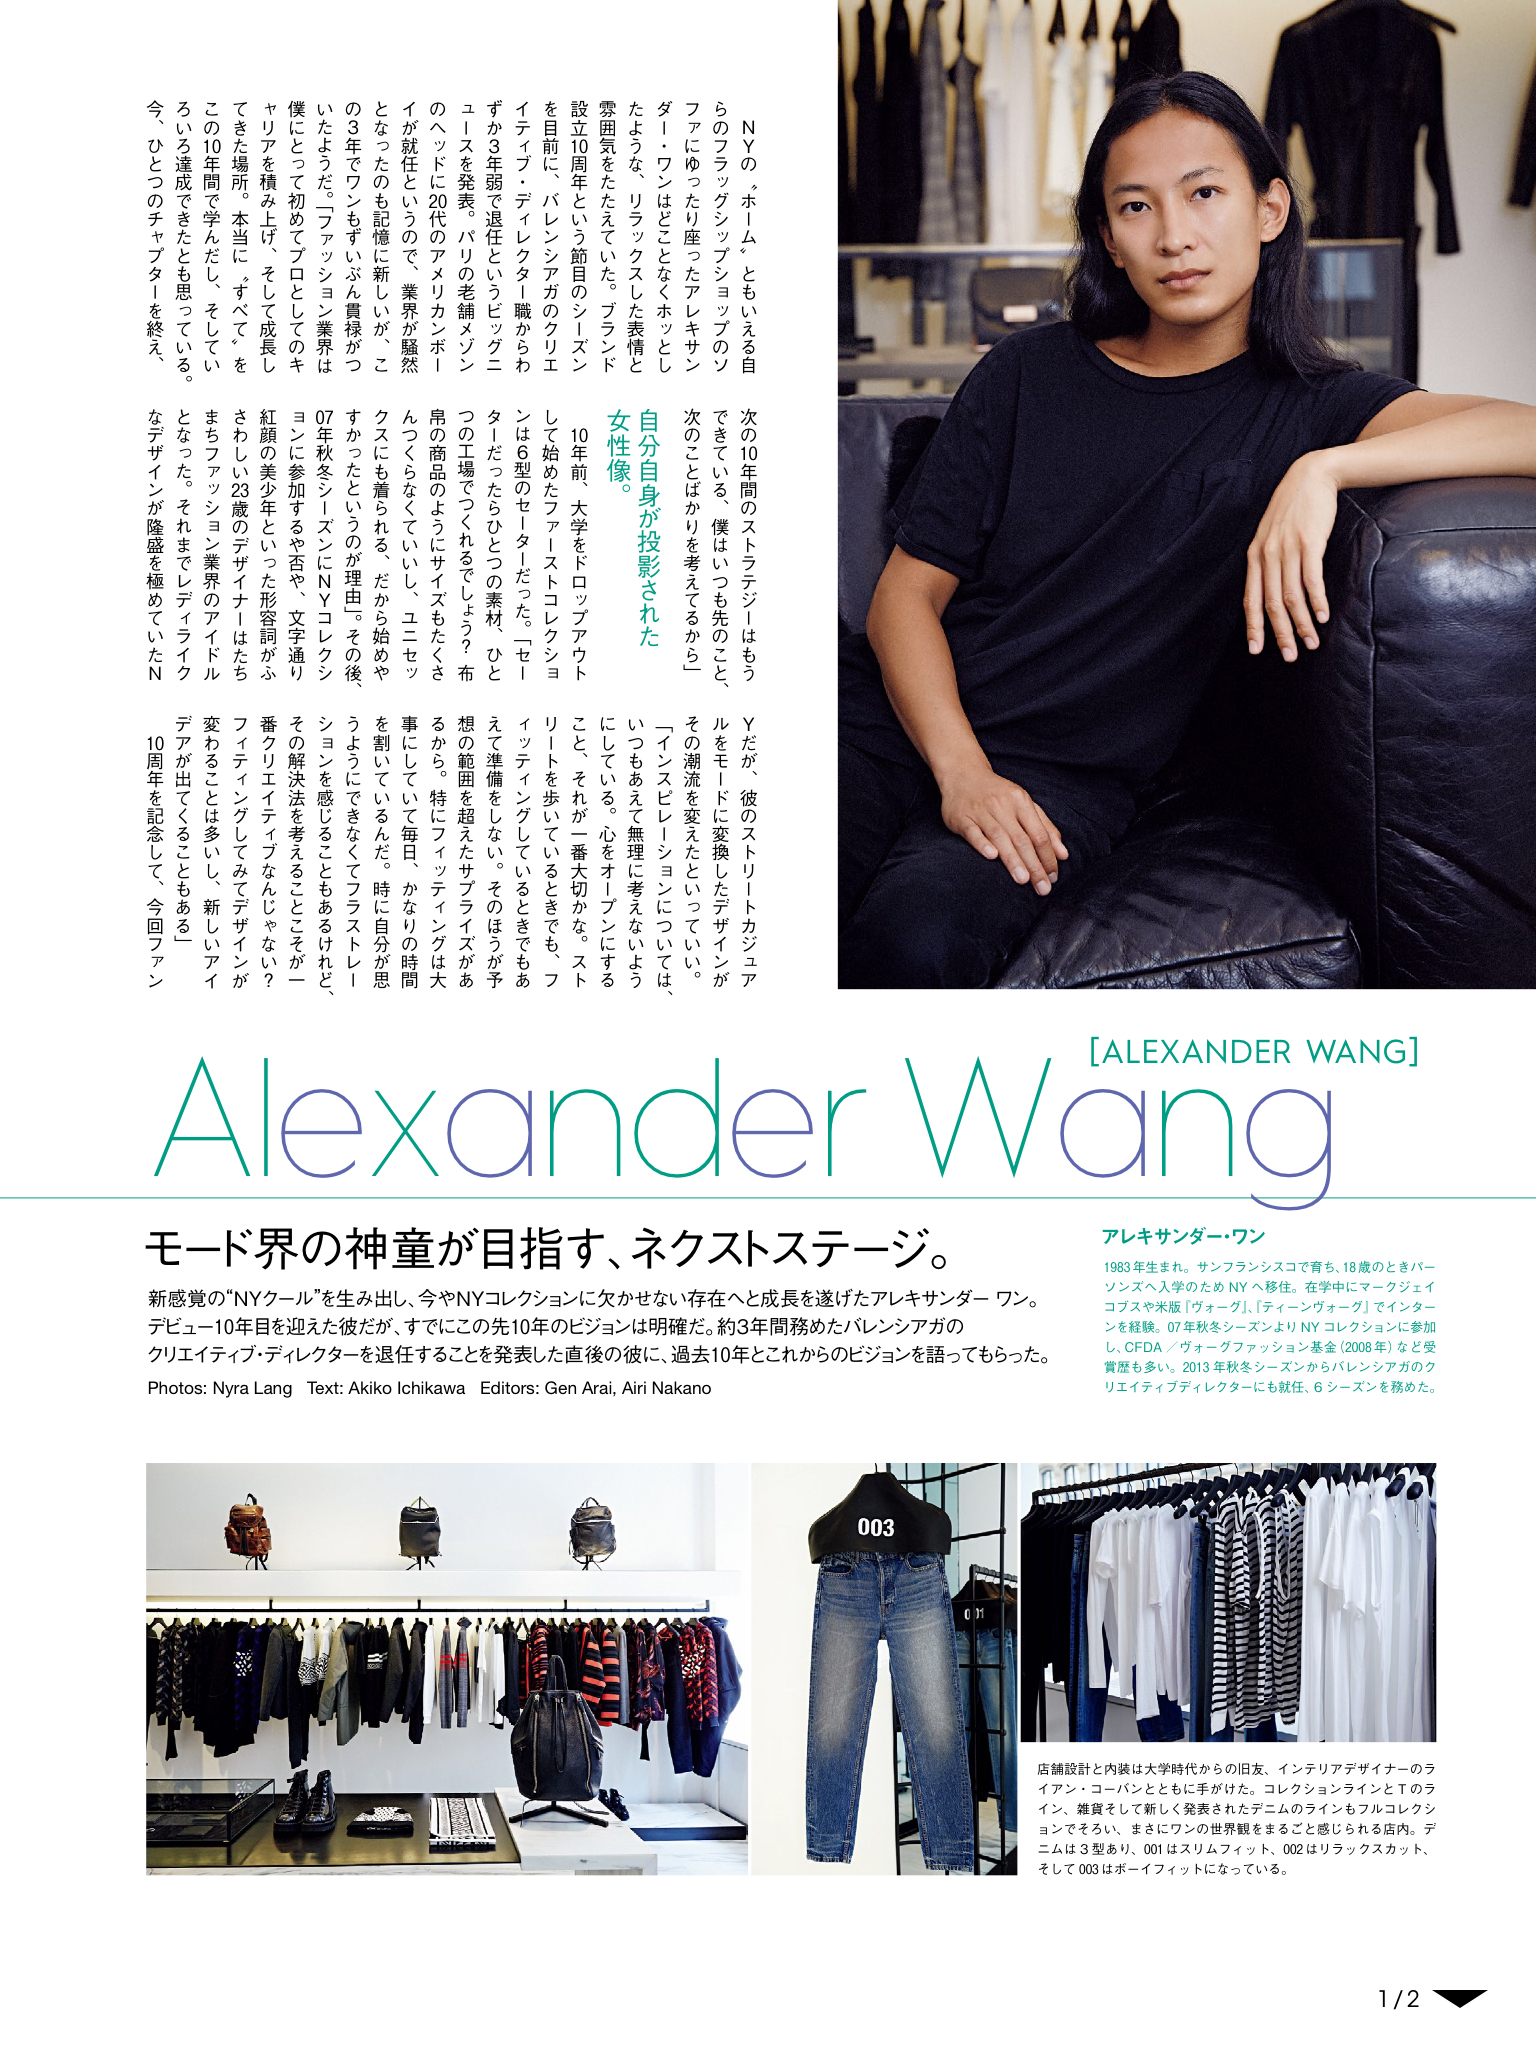 Alexander Wang for Vogue Japan